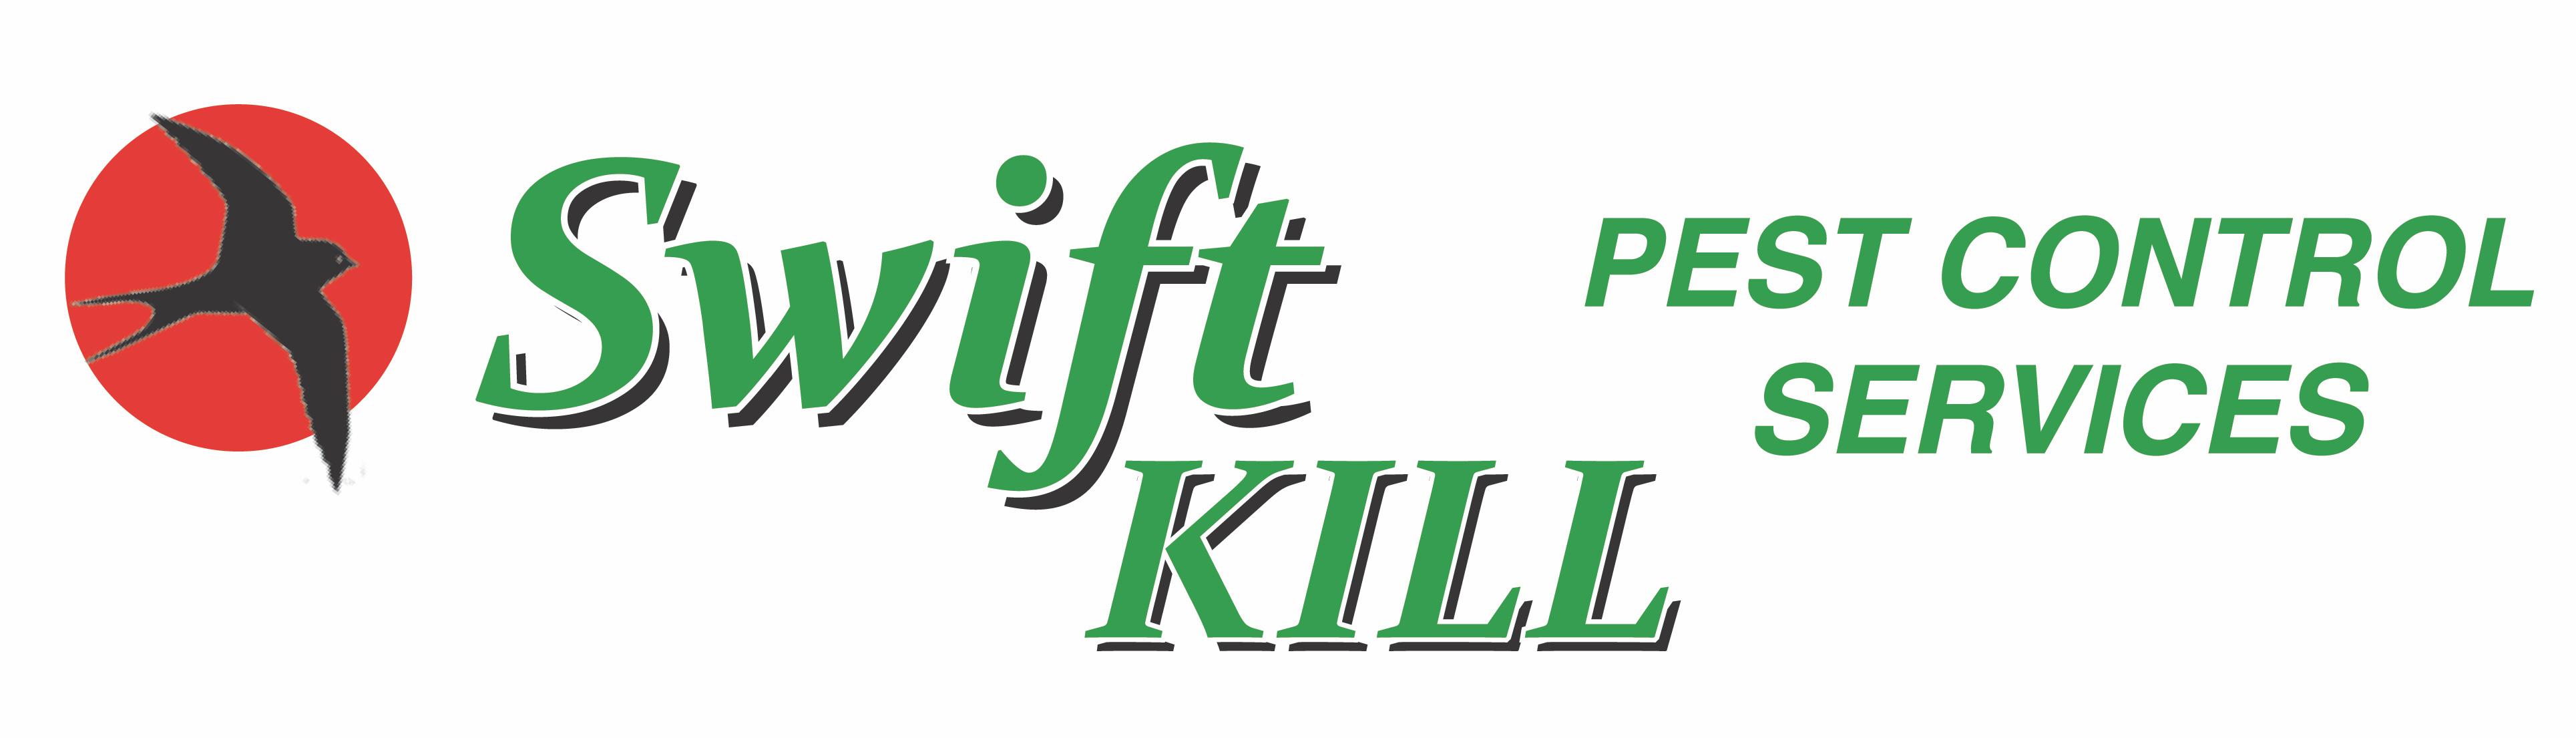 Swift Pest Control Blackrock   Deal for Swift Drain Cleaning Blackrock customers